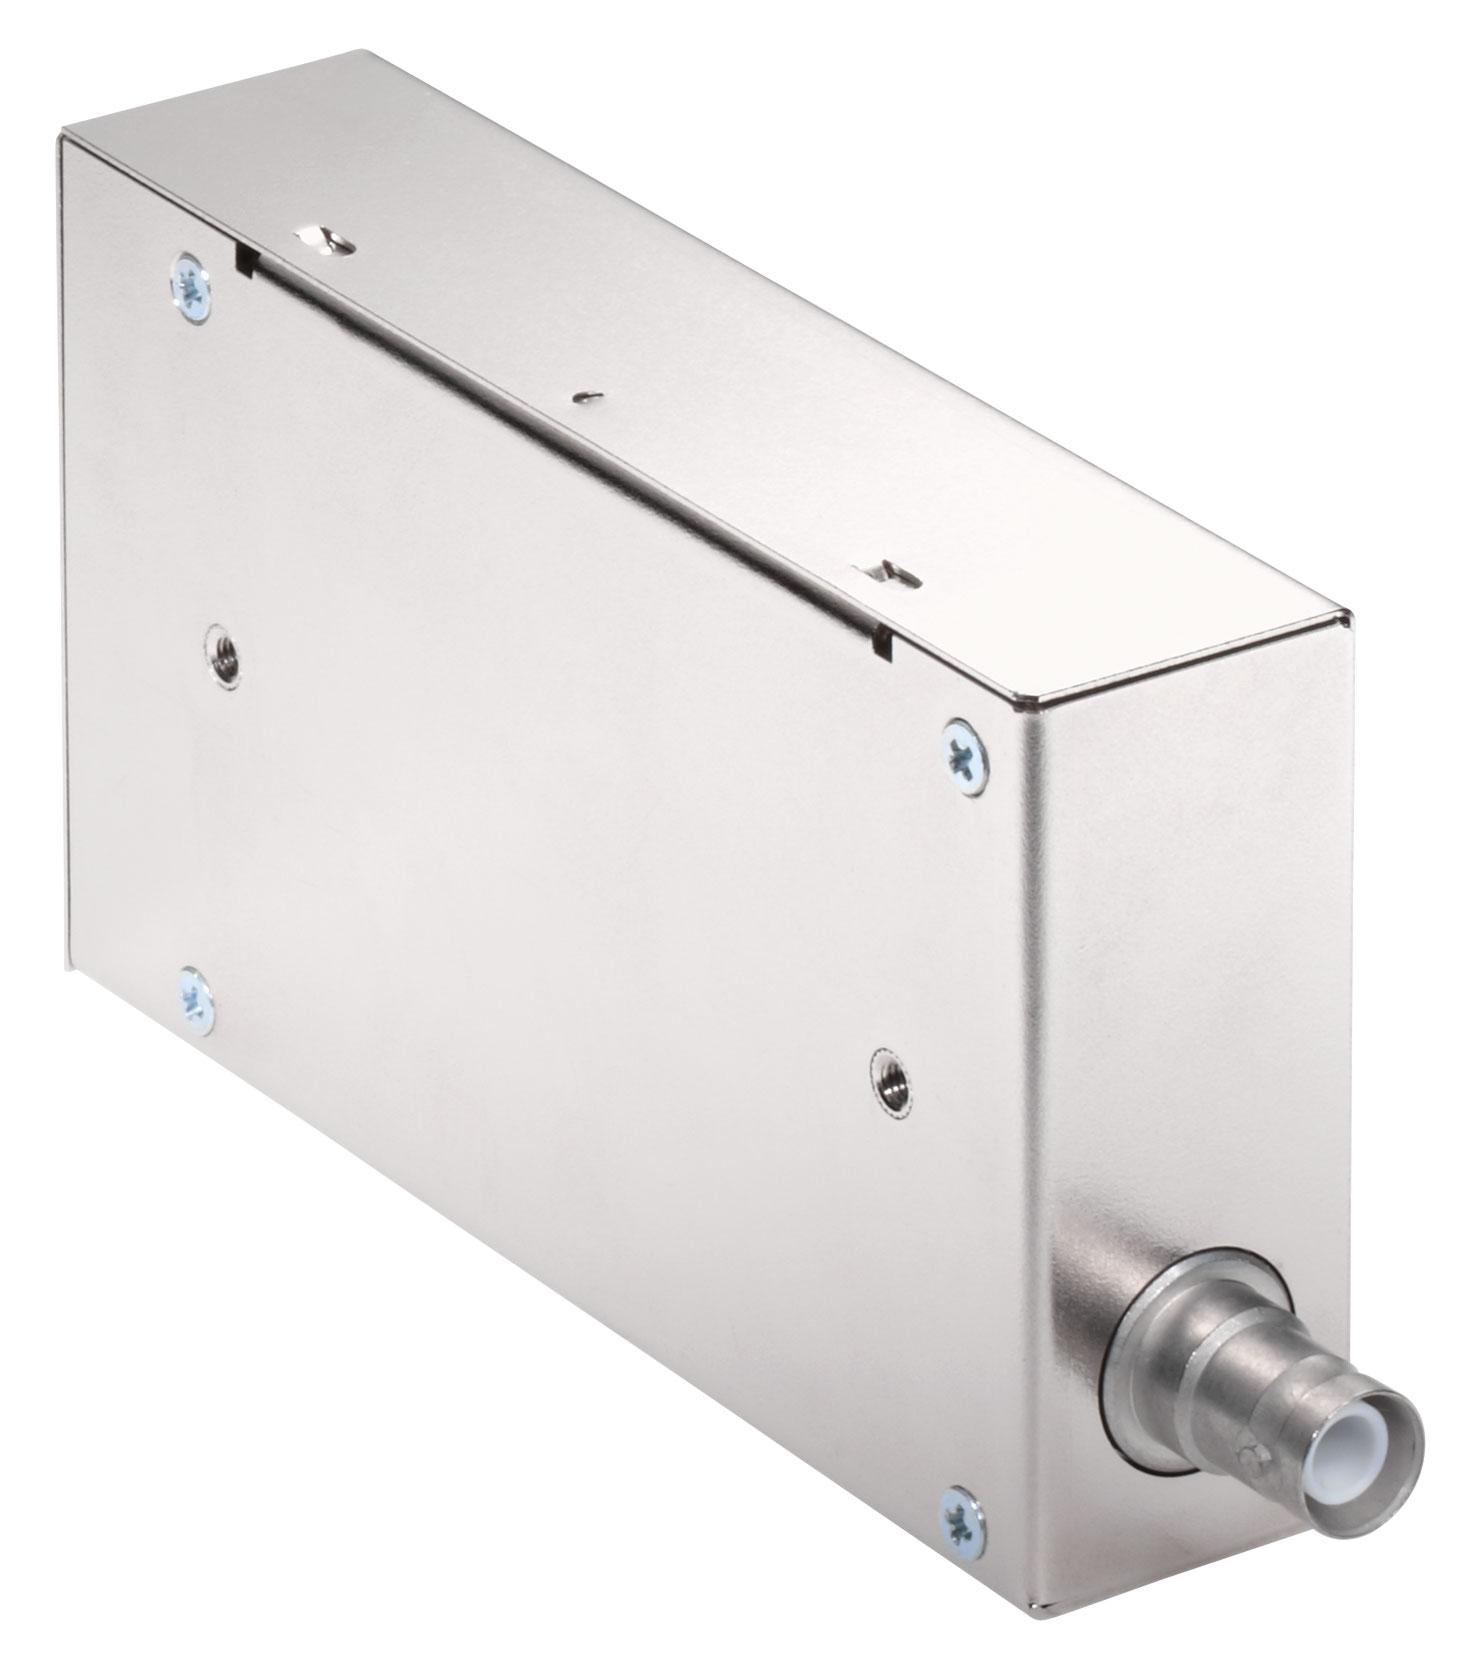 Convertisseur haute tension DC DPS-Mini montage vertical percage taraudage 4 kV 2 mA ISEG